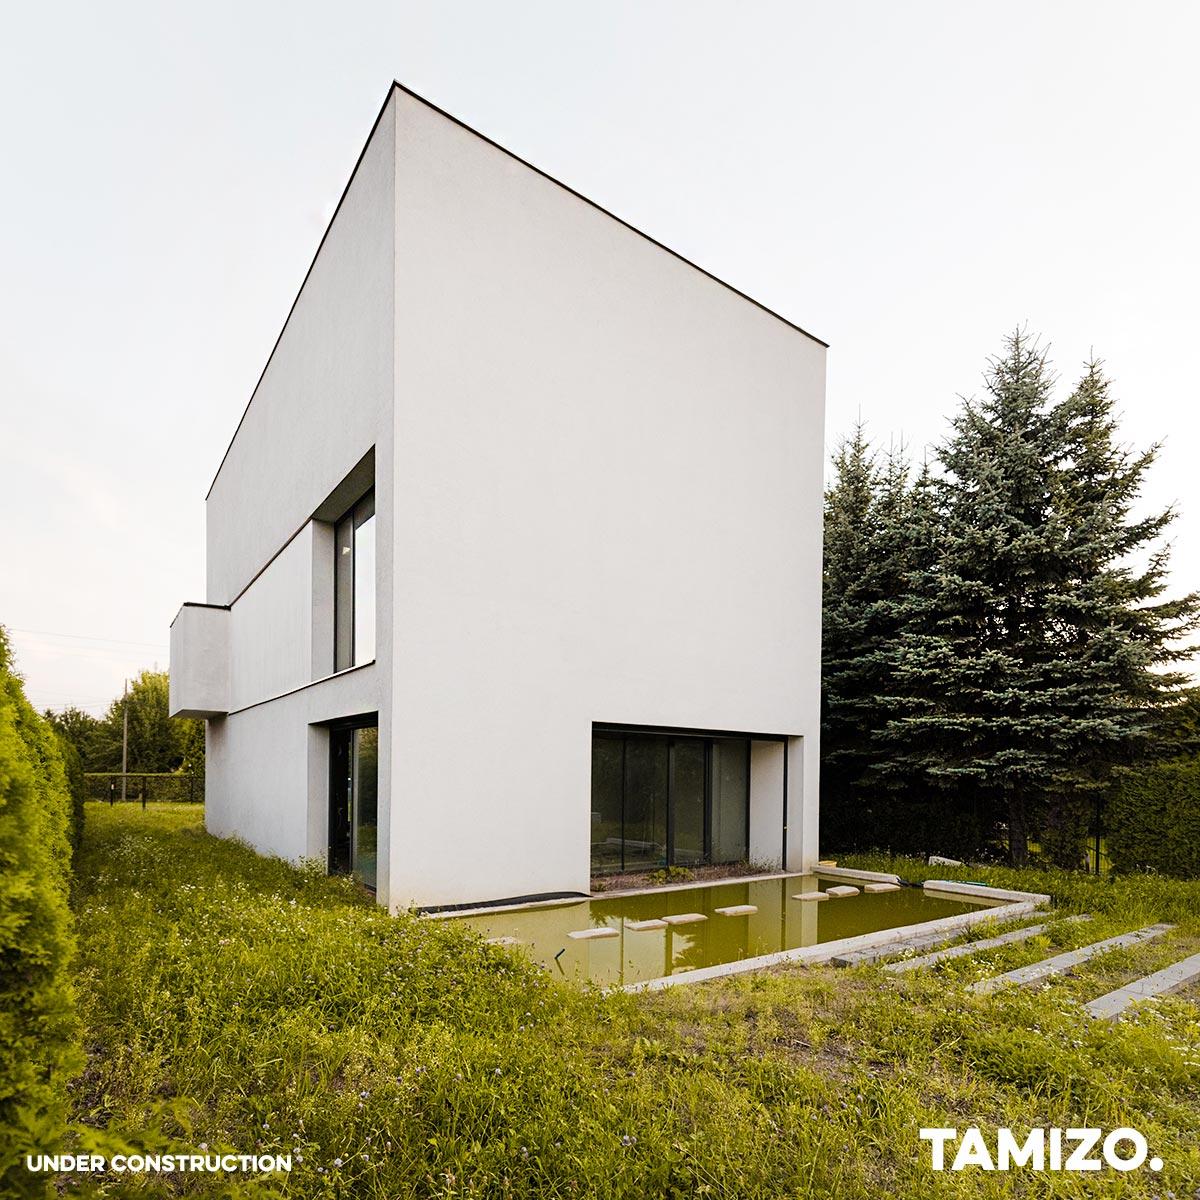 tamizo_architekt_dom_projekt_h_house_pabianice_04